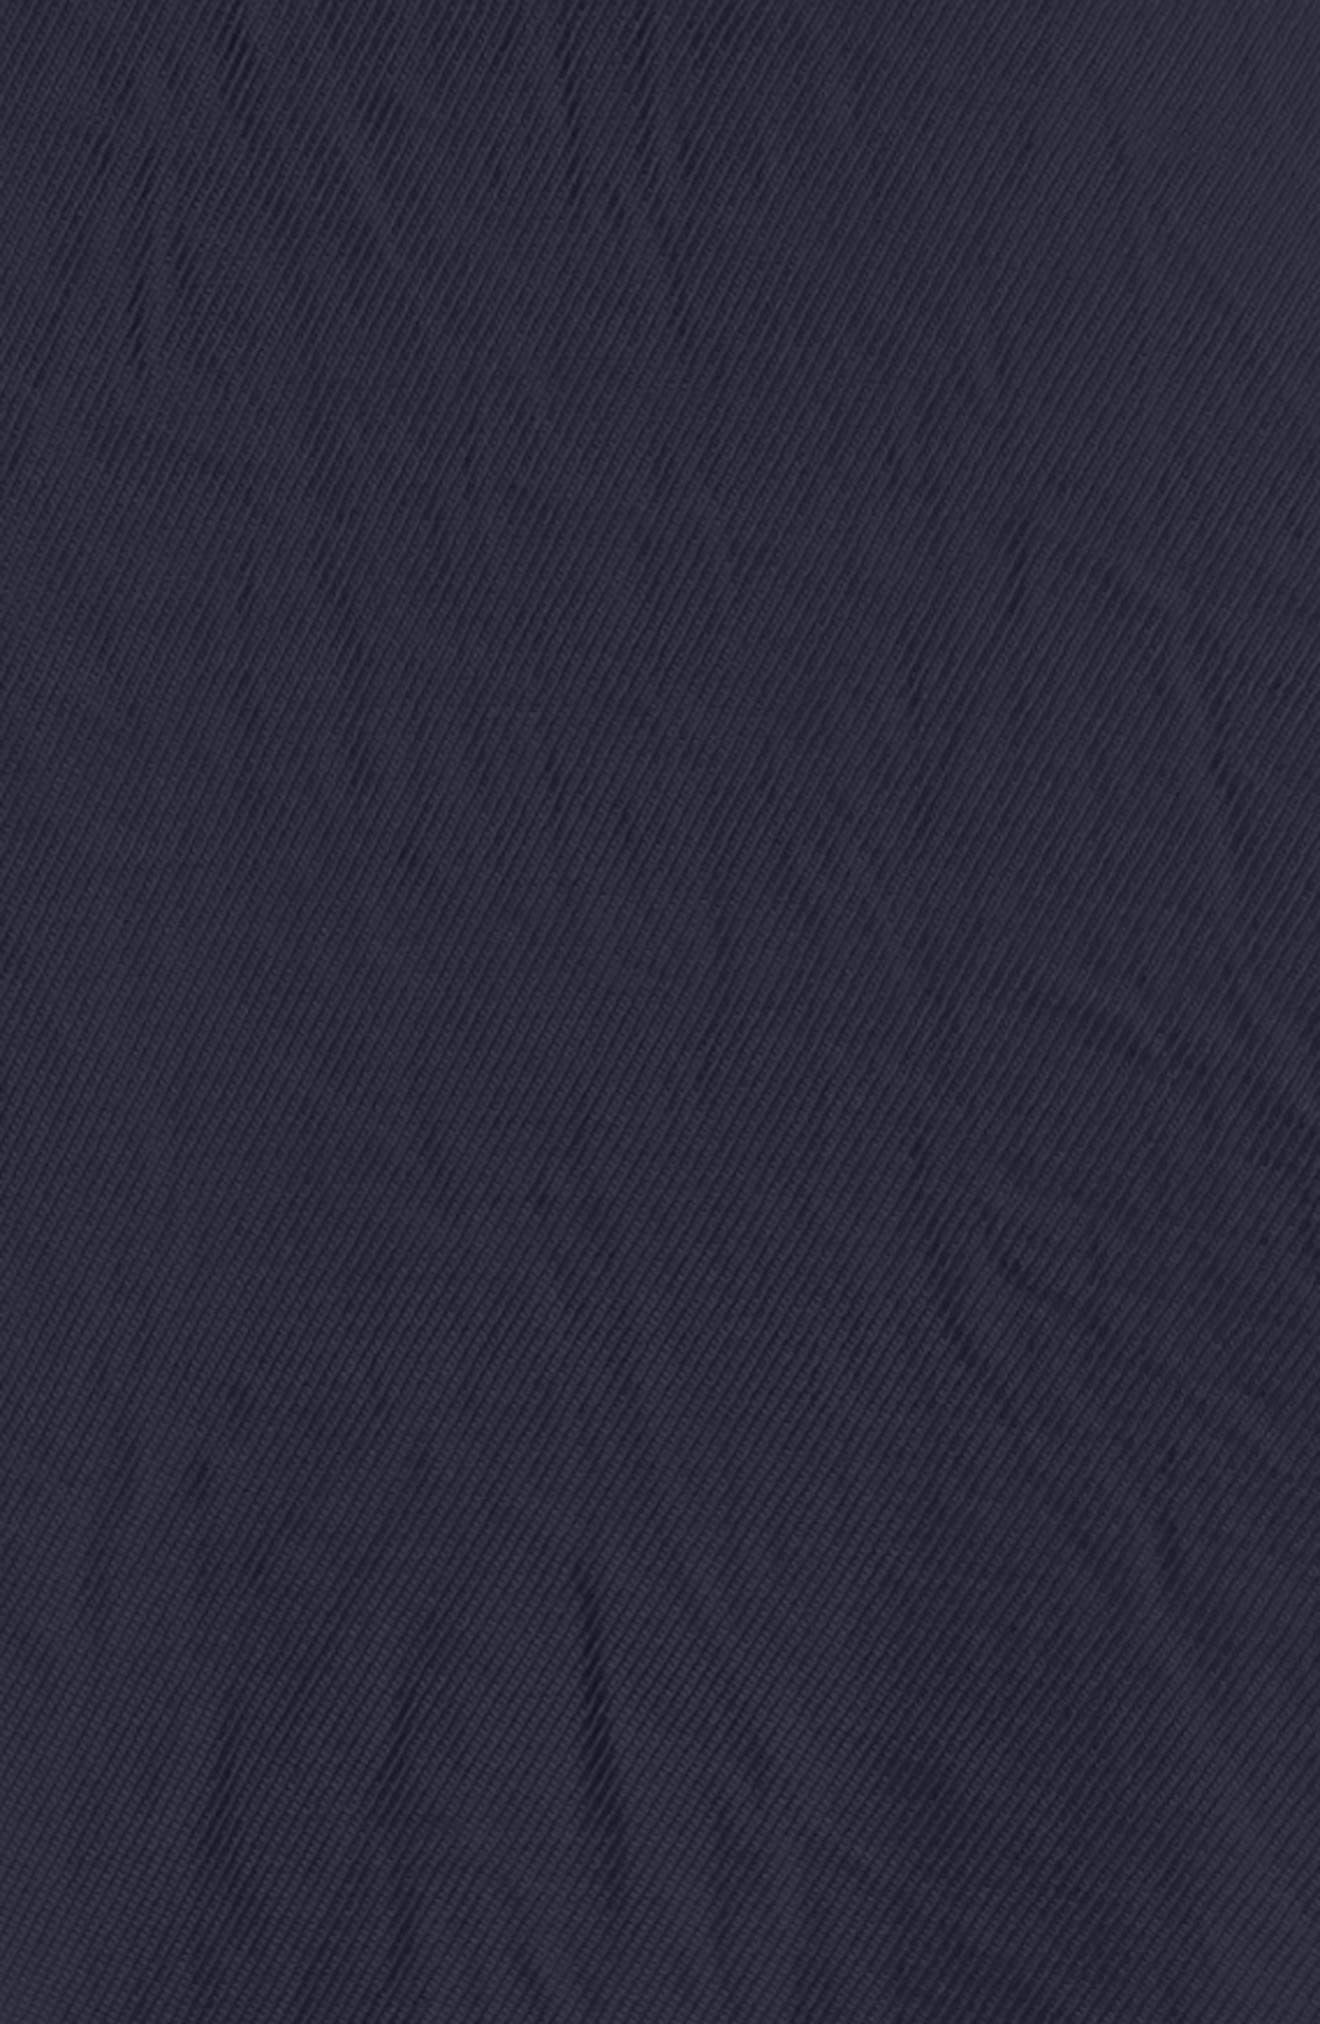 Ruffle Tank Dress,                             Alternate thumbnail 5, color,                             Midnight